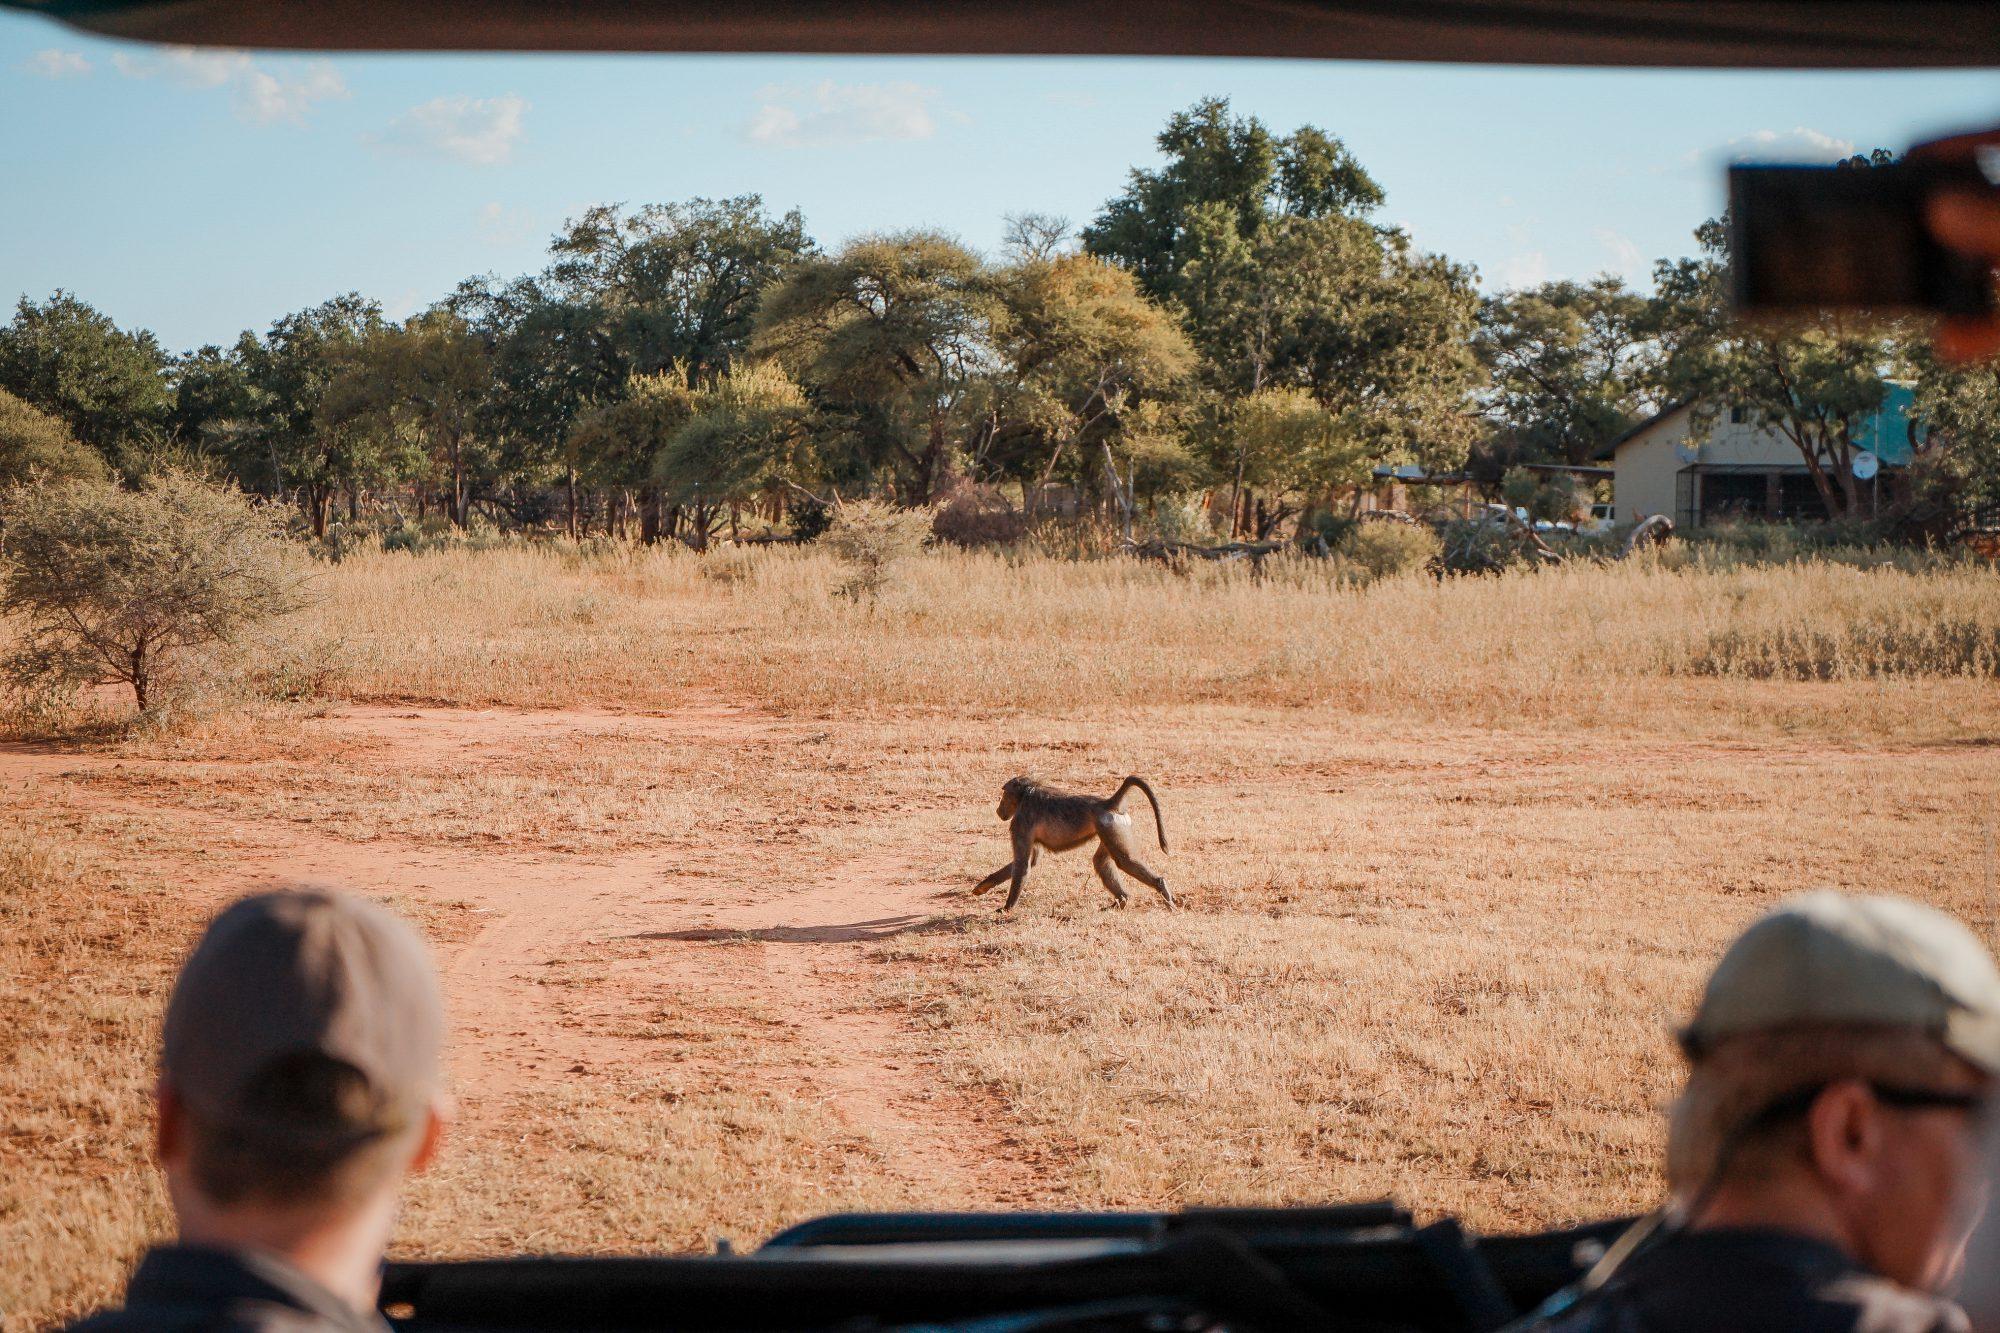 Deep in the Safari, South Africa.